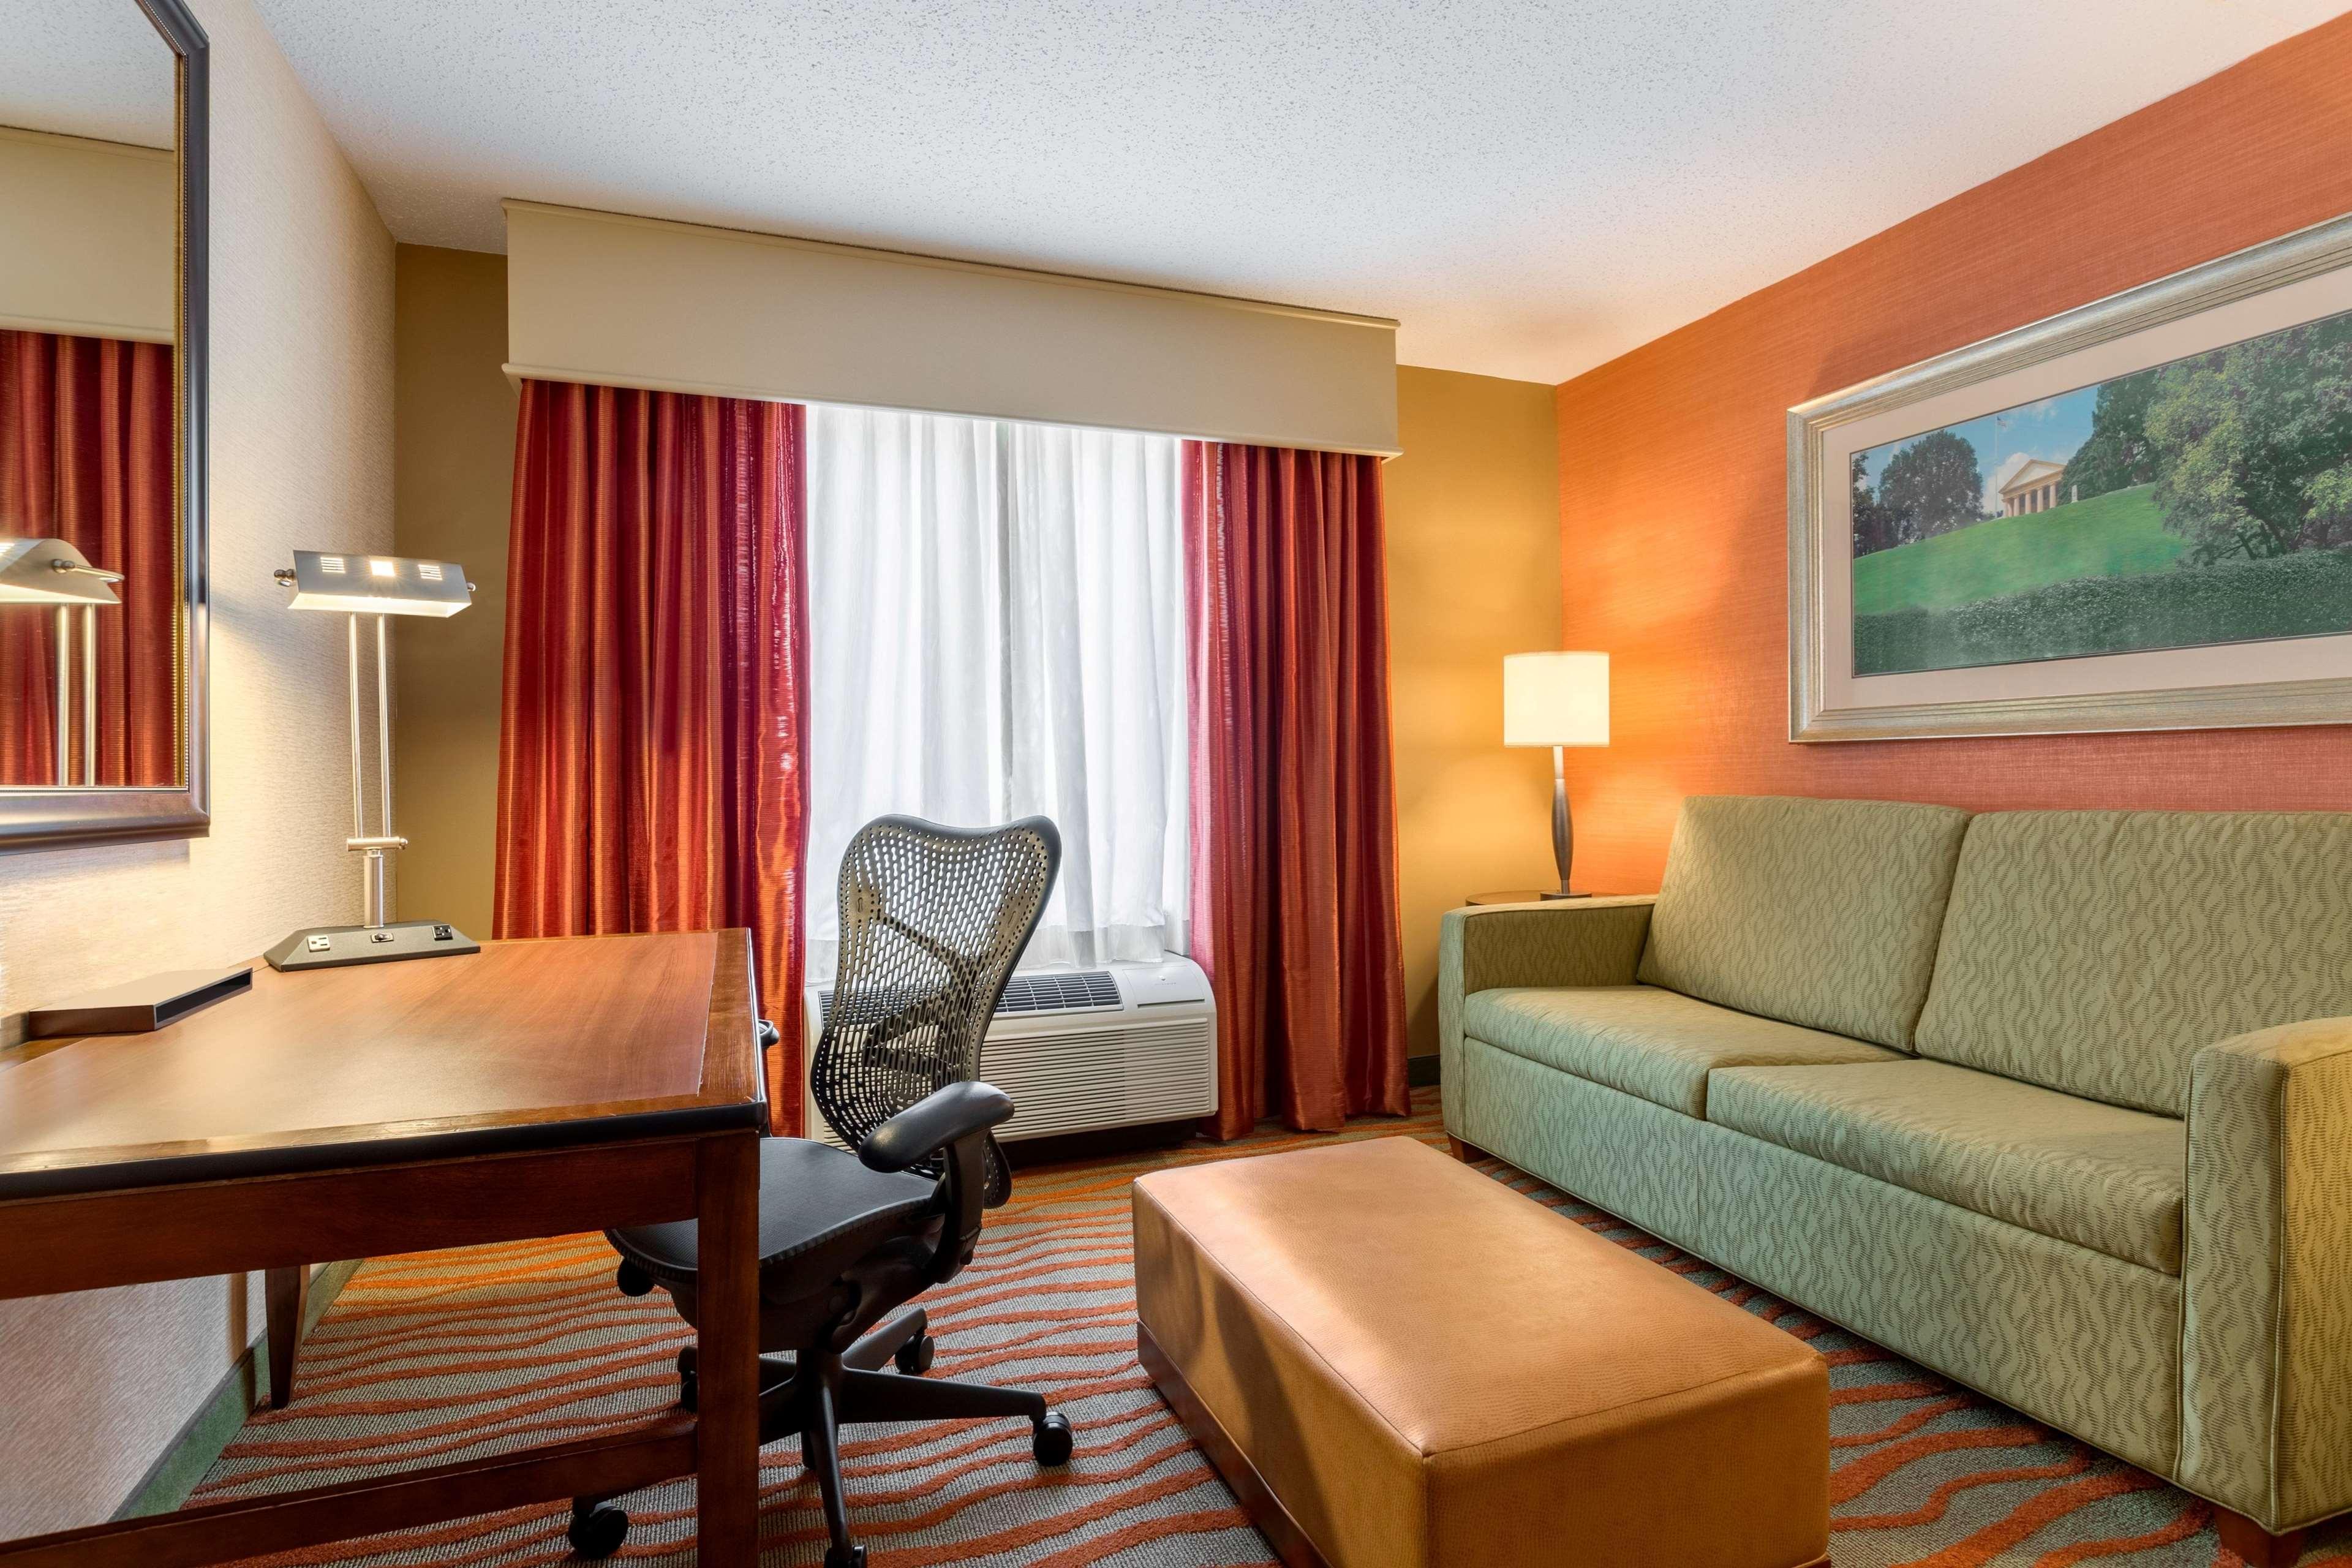 Hilton Garden Inn Arlington/Courthouse Plaza image 20